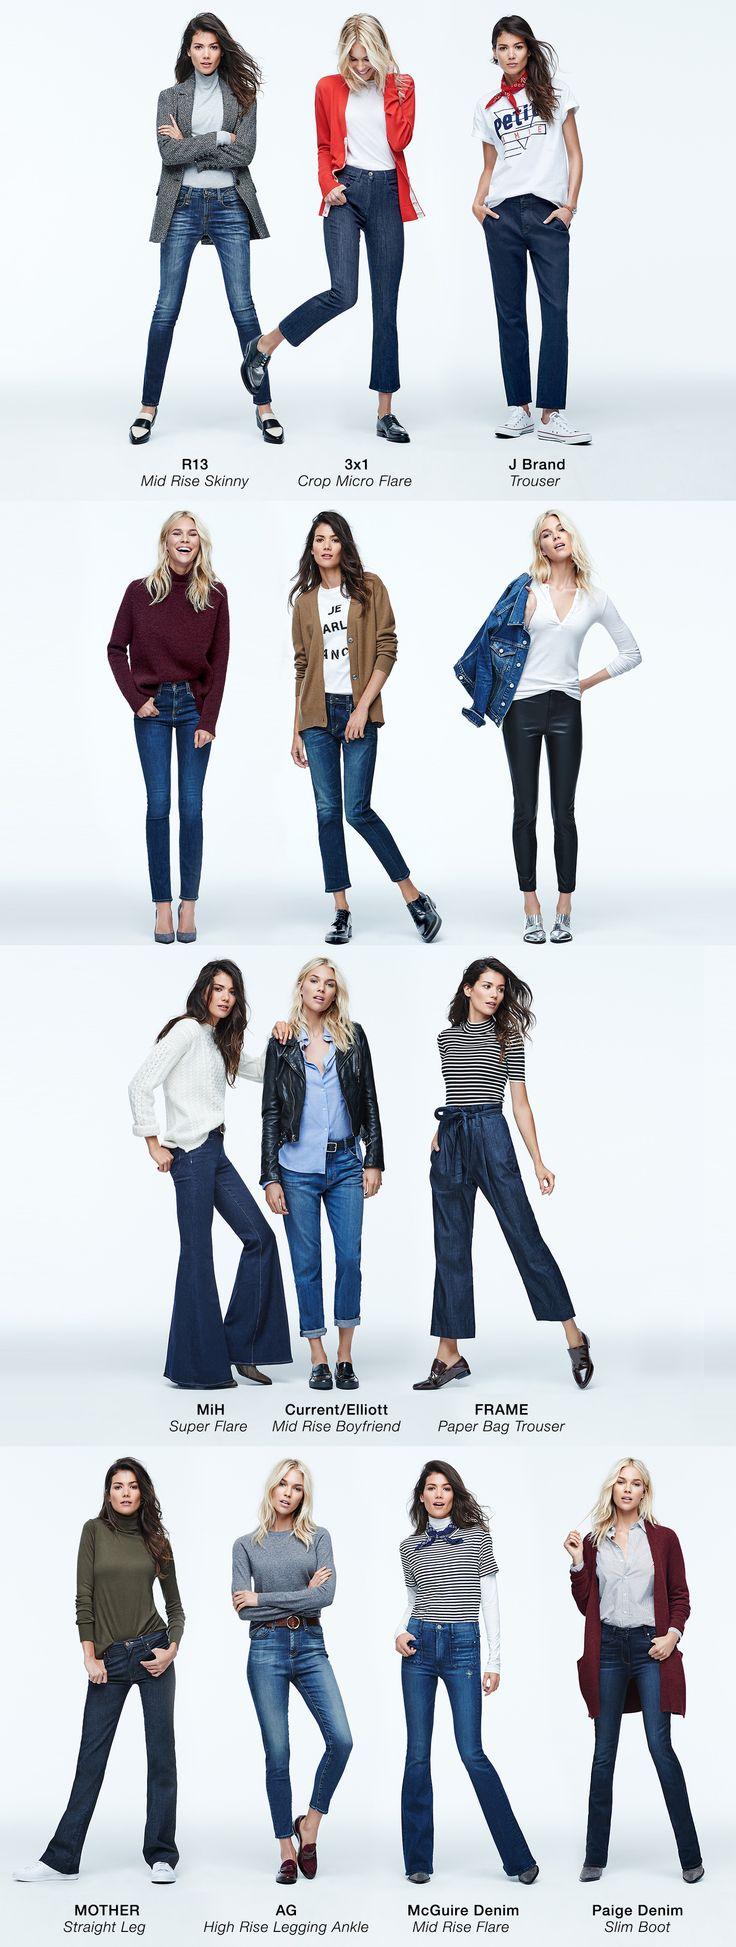 Shopbop Launches, The Principle Collection